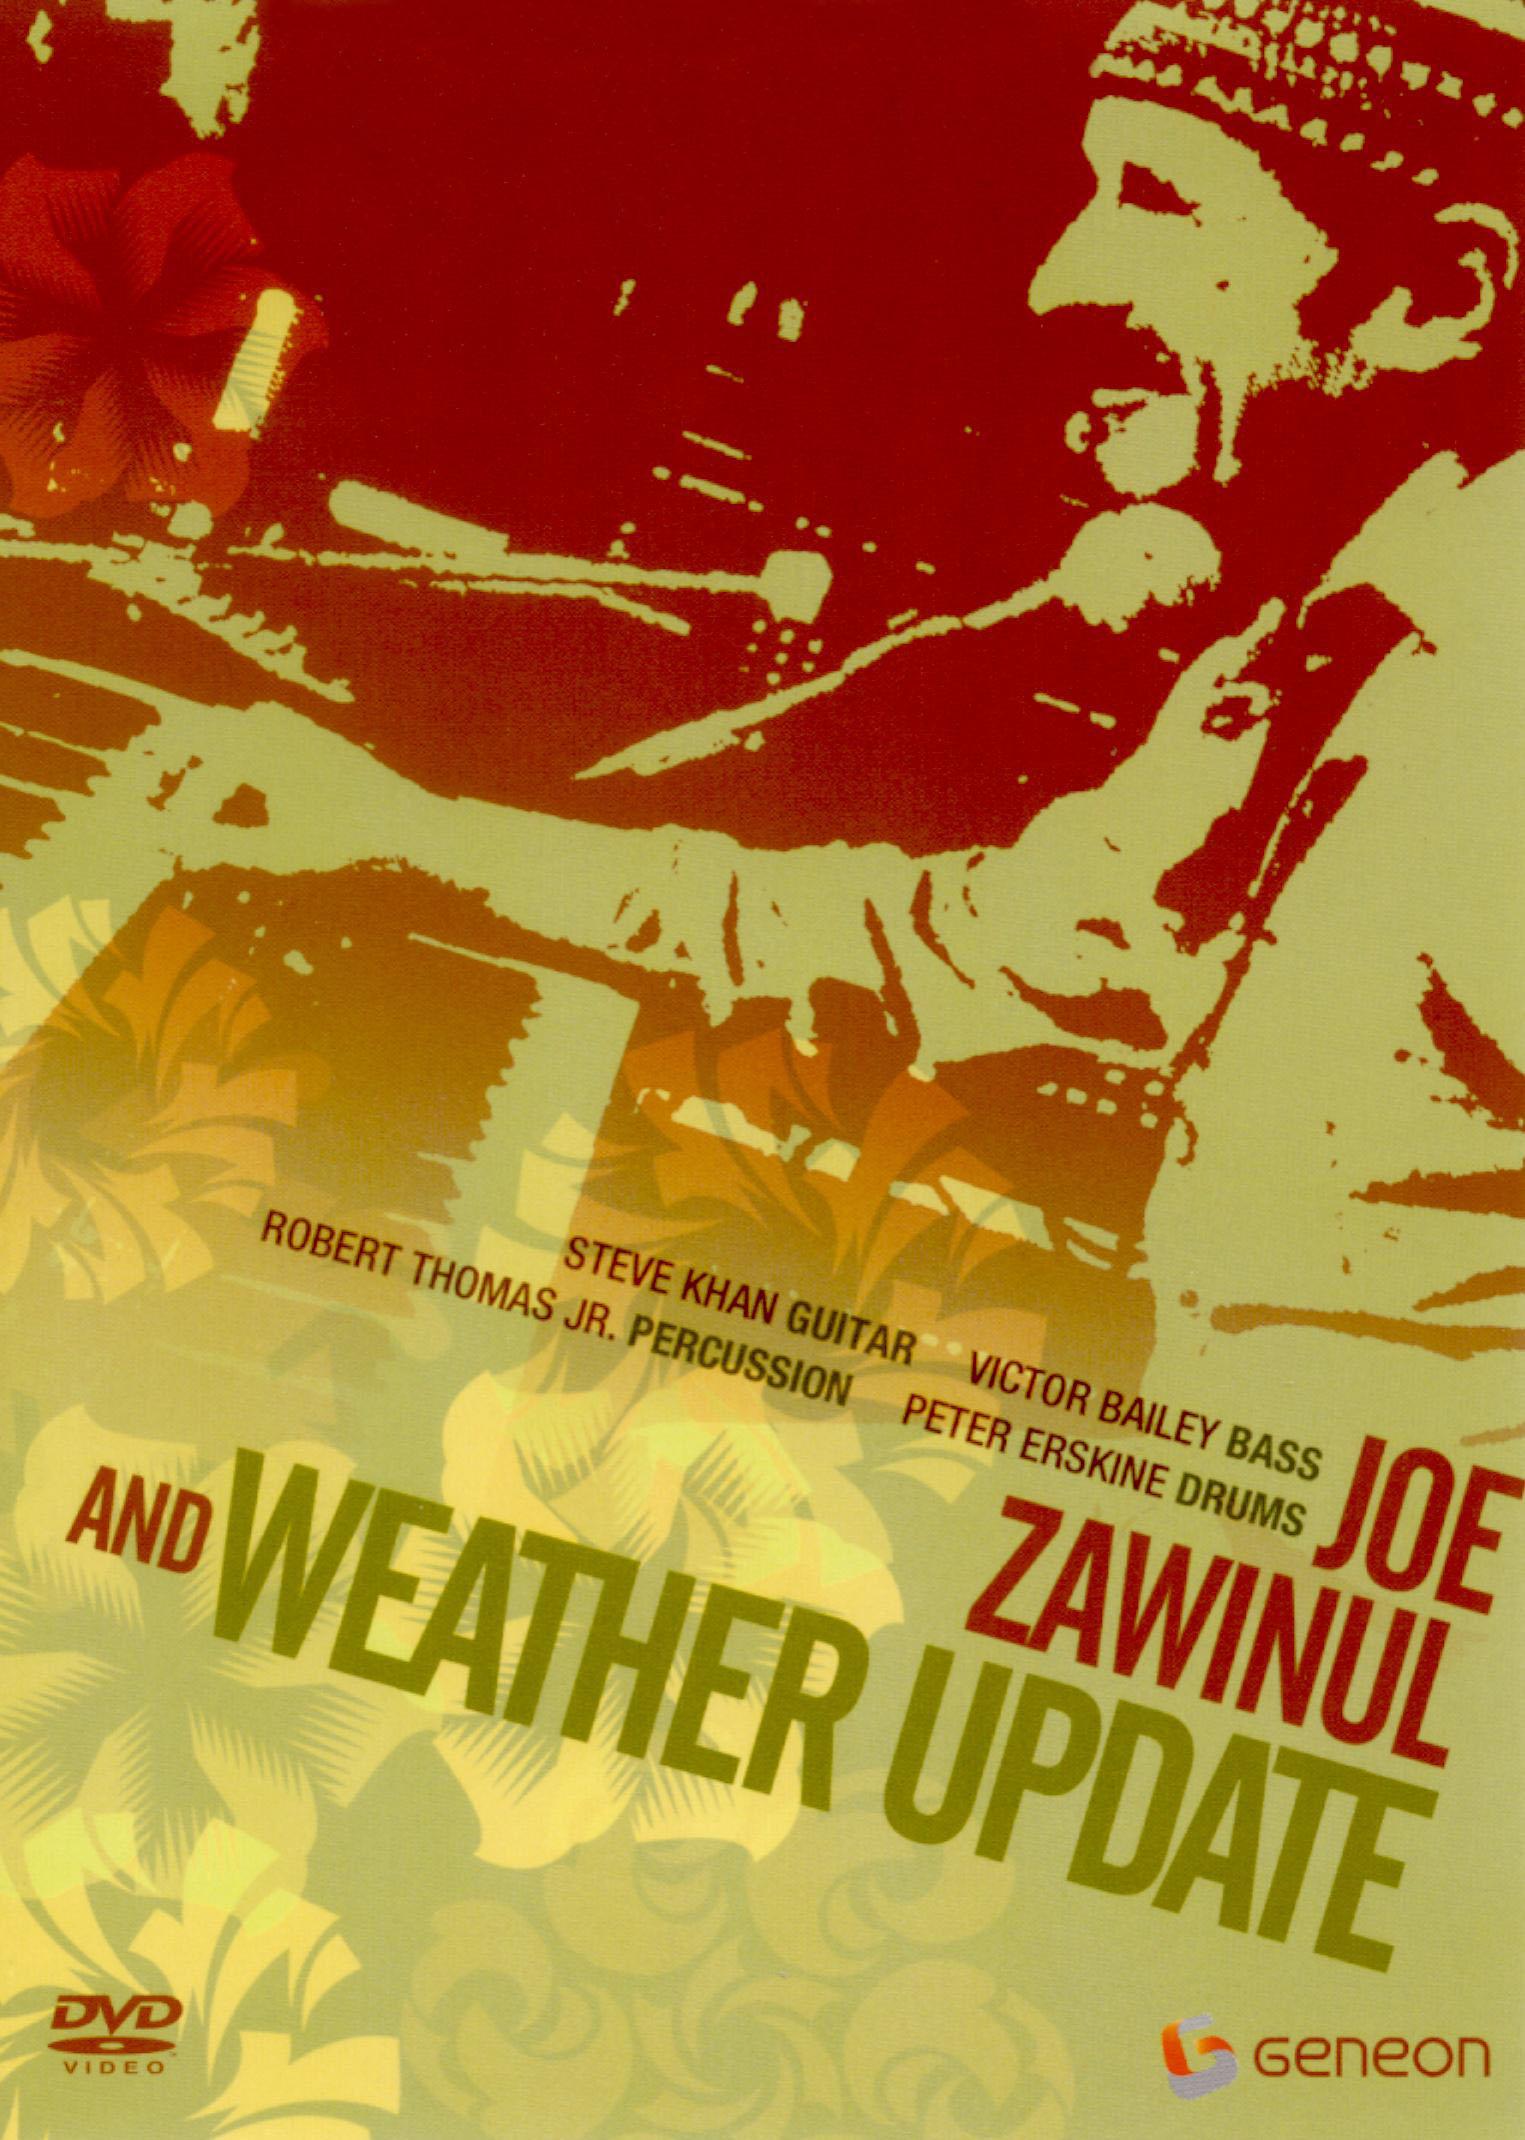 Joe Zawinul: Weather Update